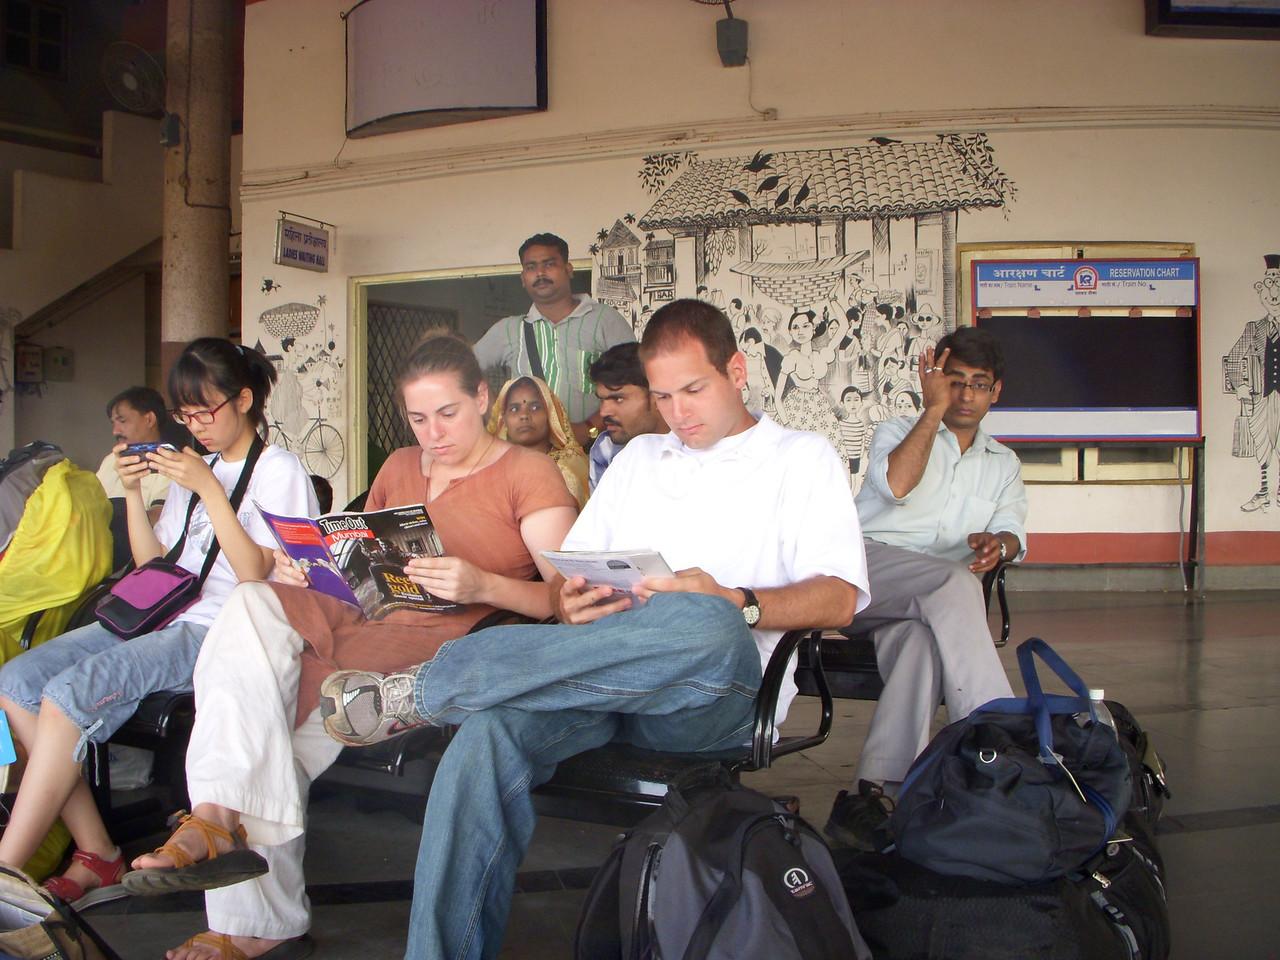 Cheryl and Jon waiting for the train in Goa